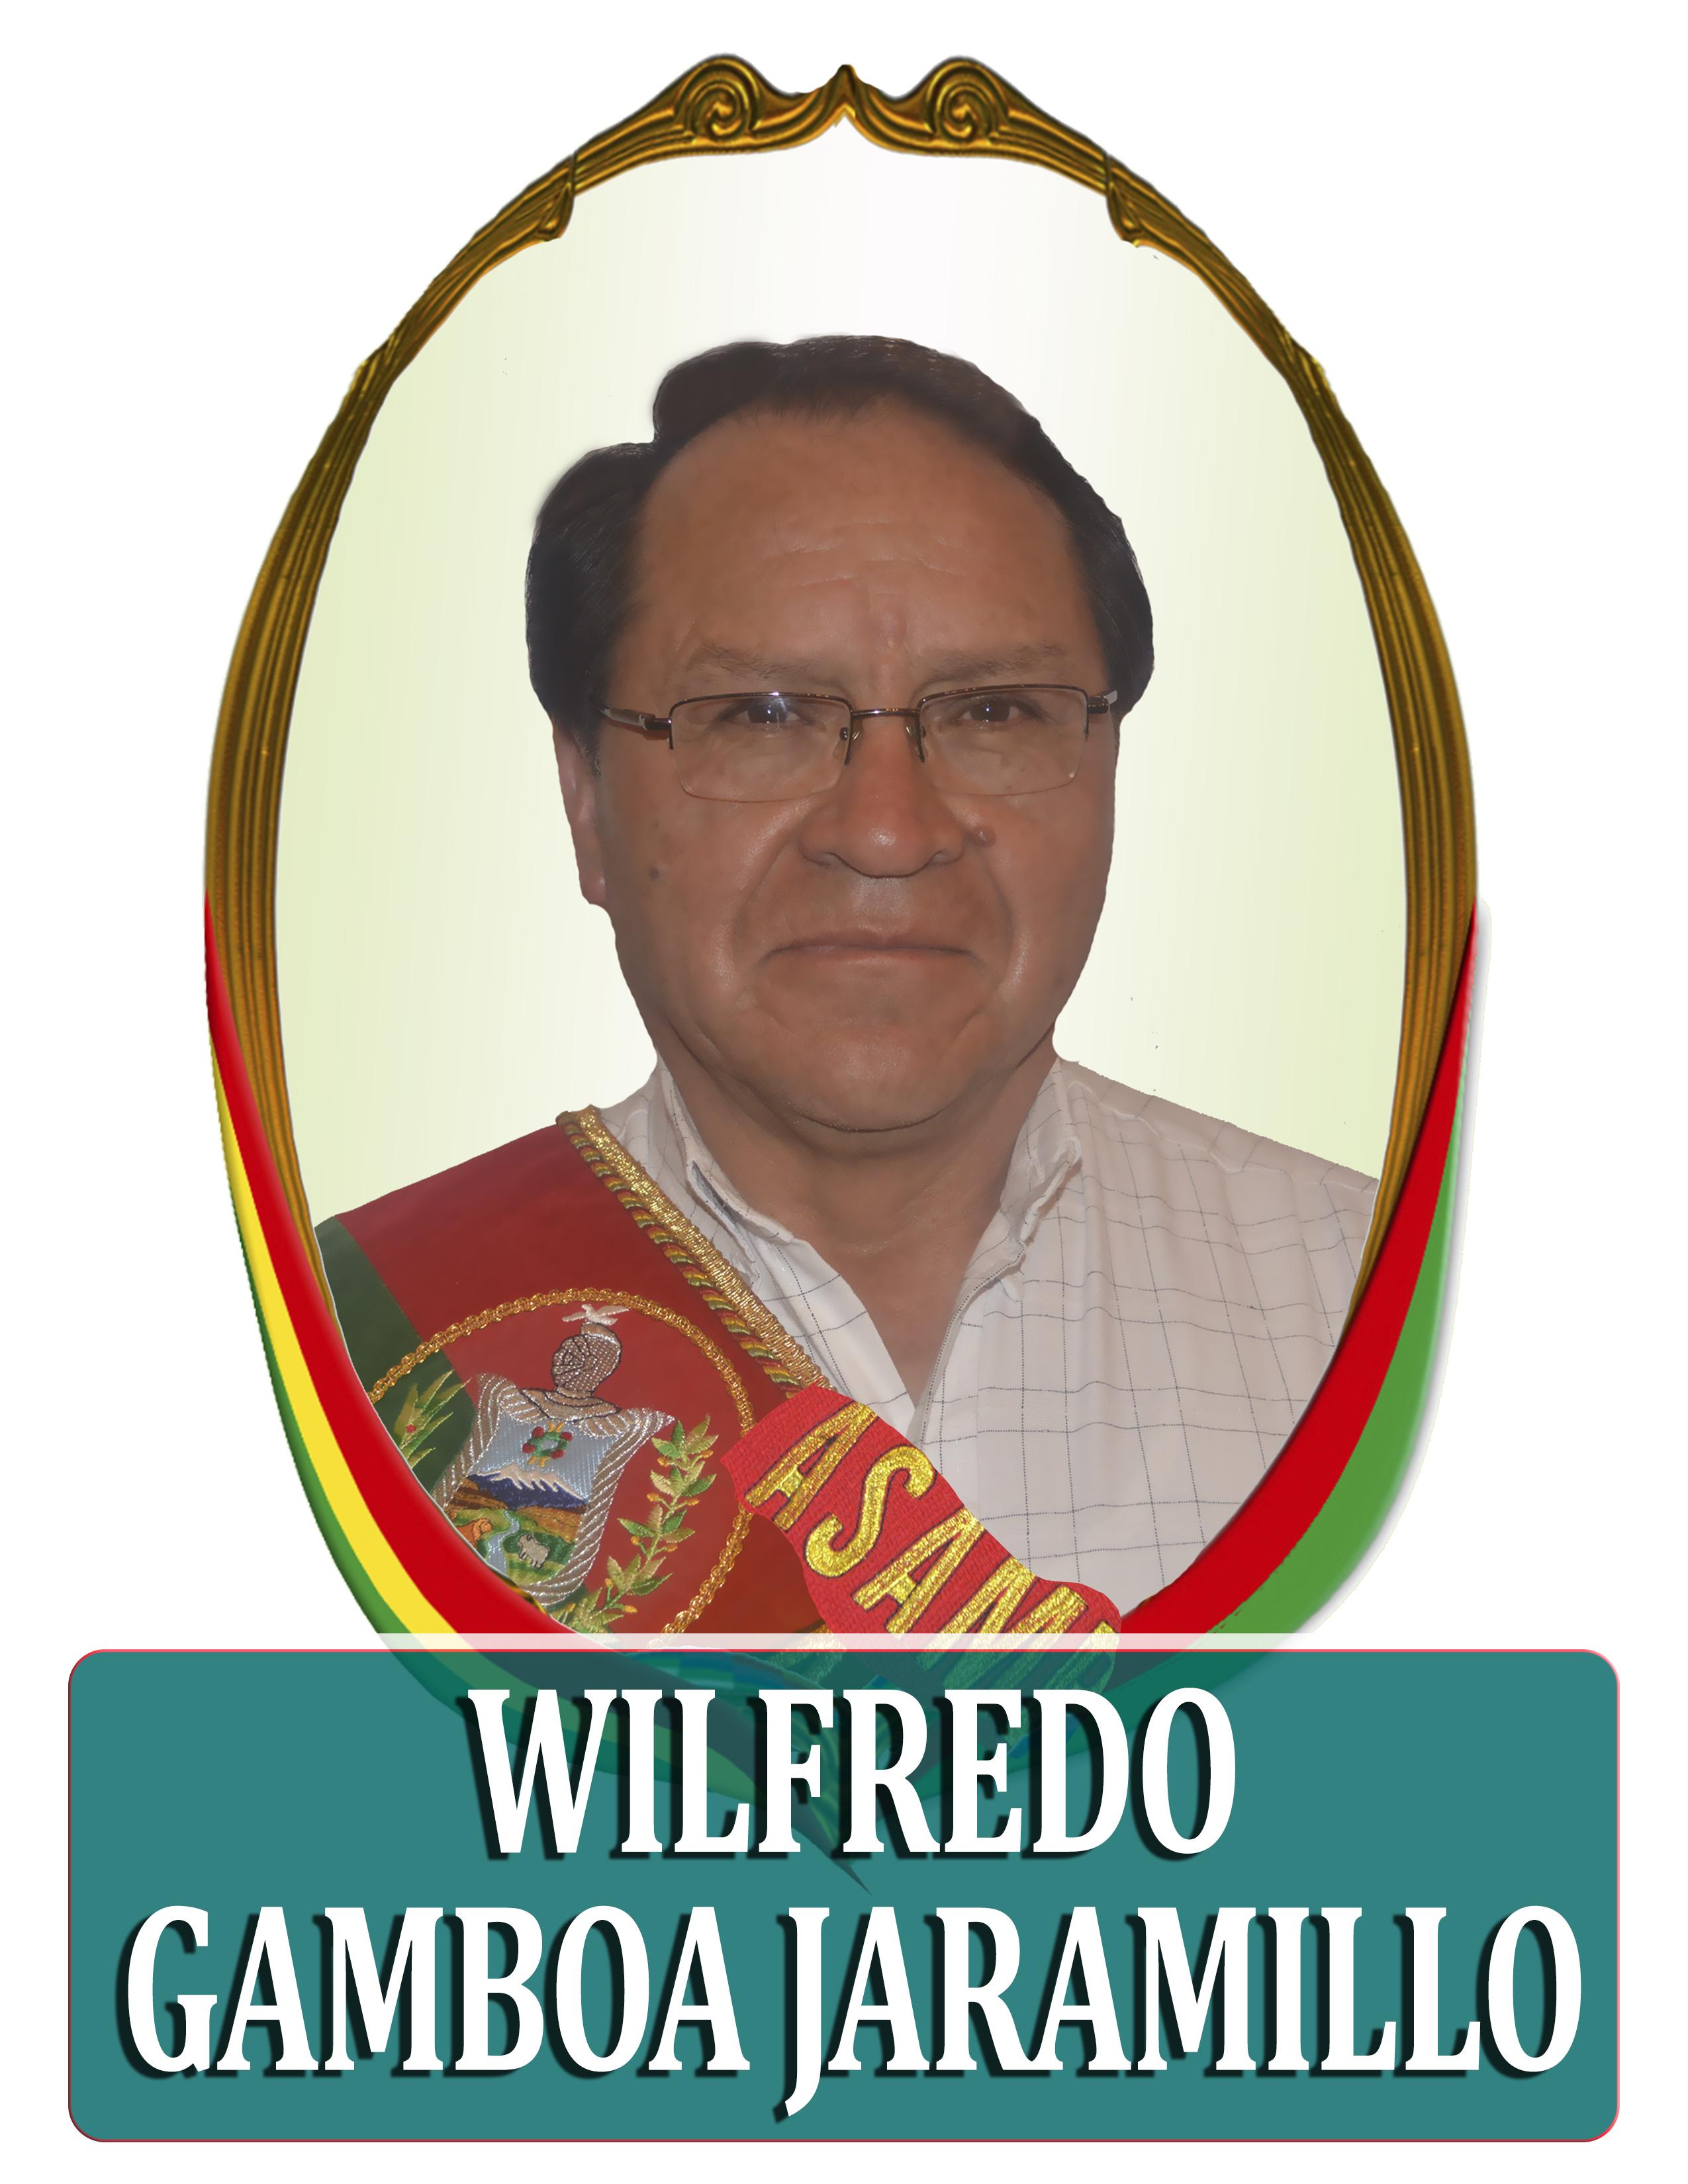 WILFREDO GAMBOA JARAMILLO